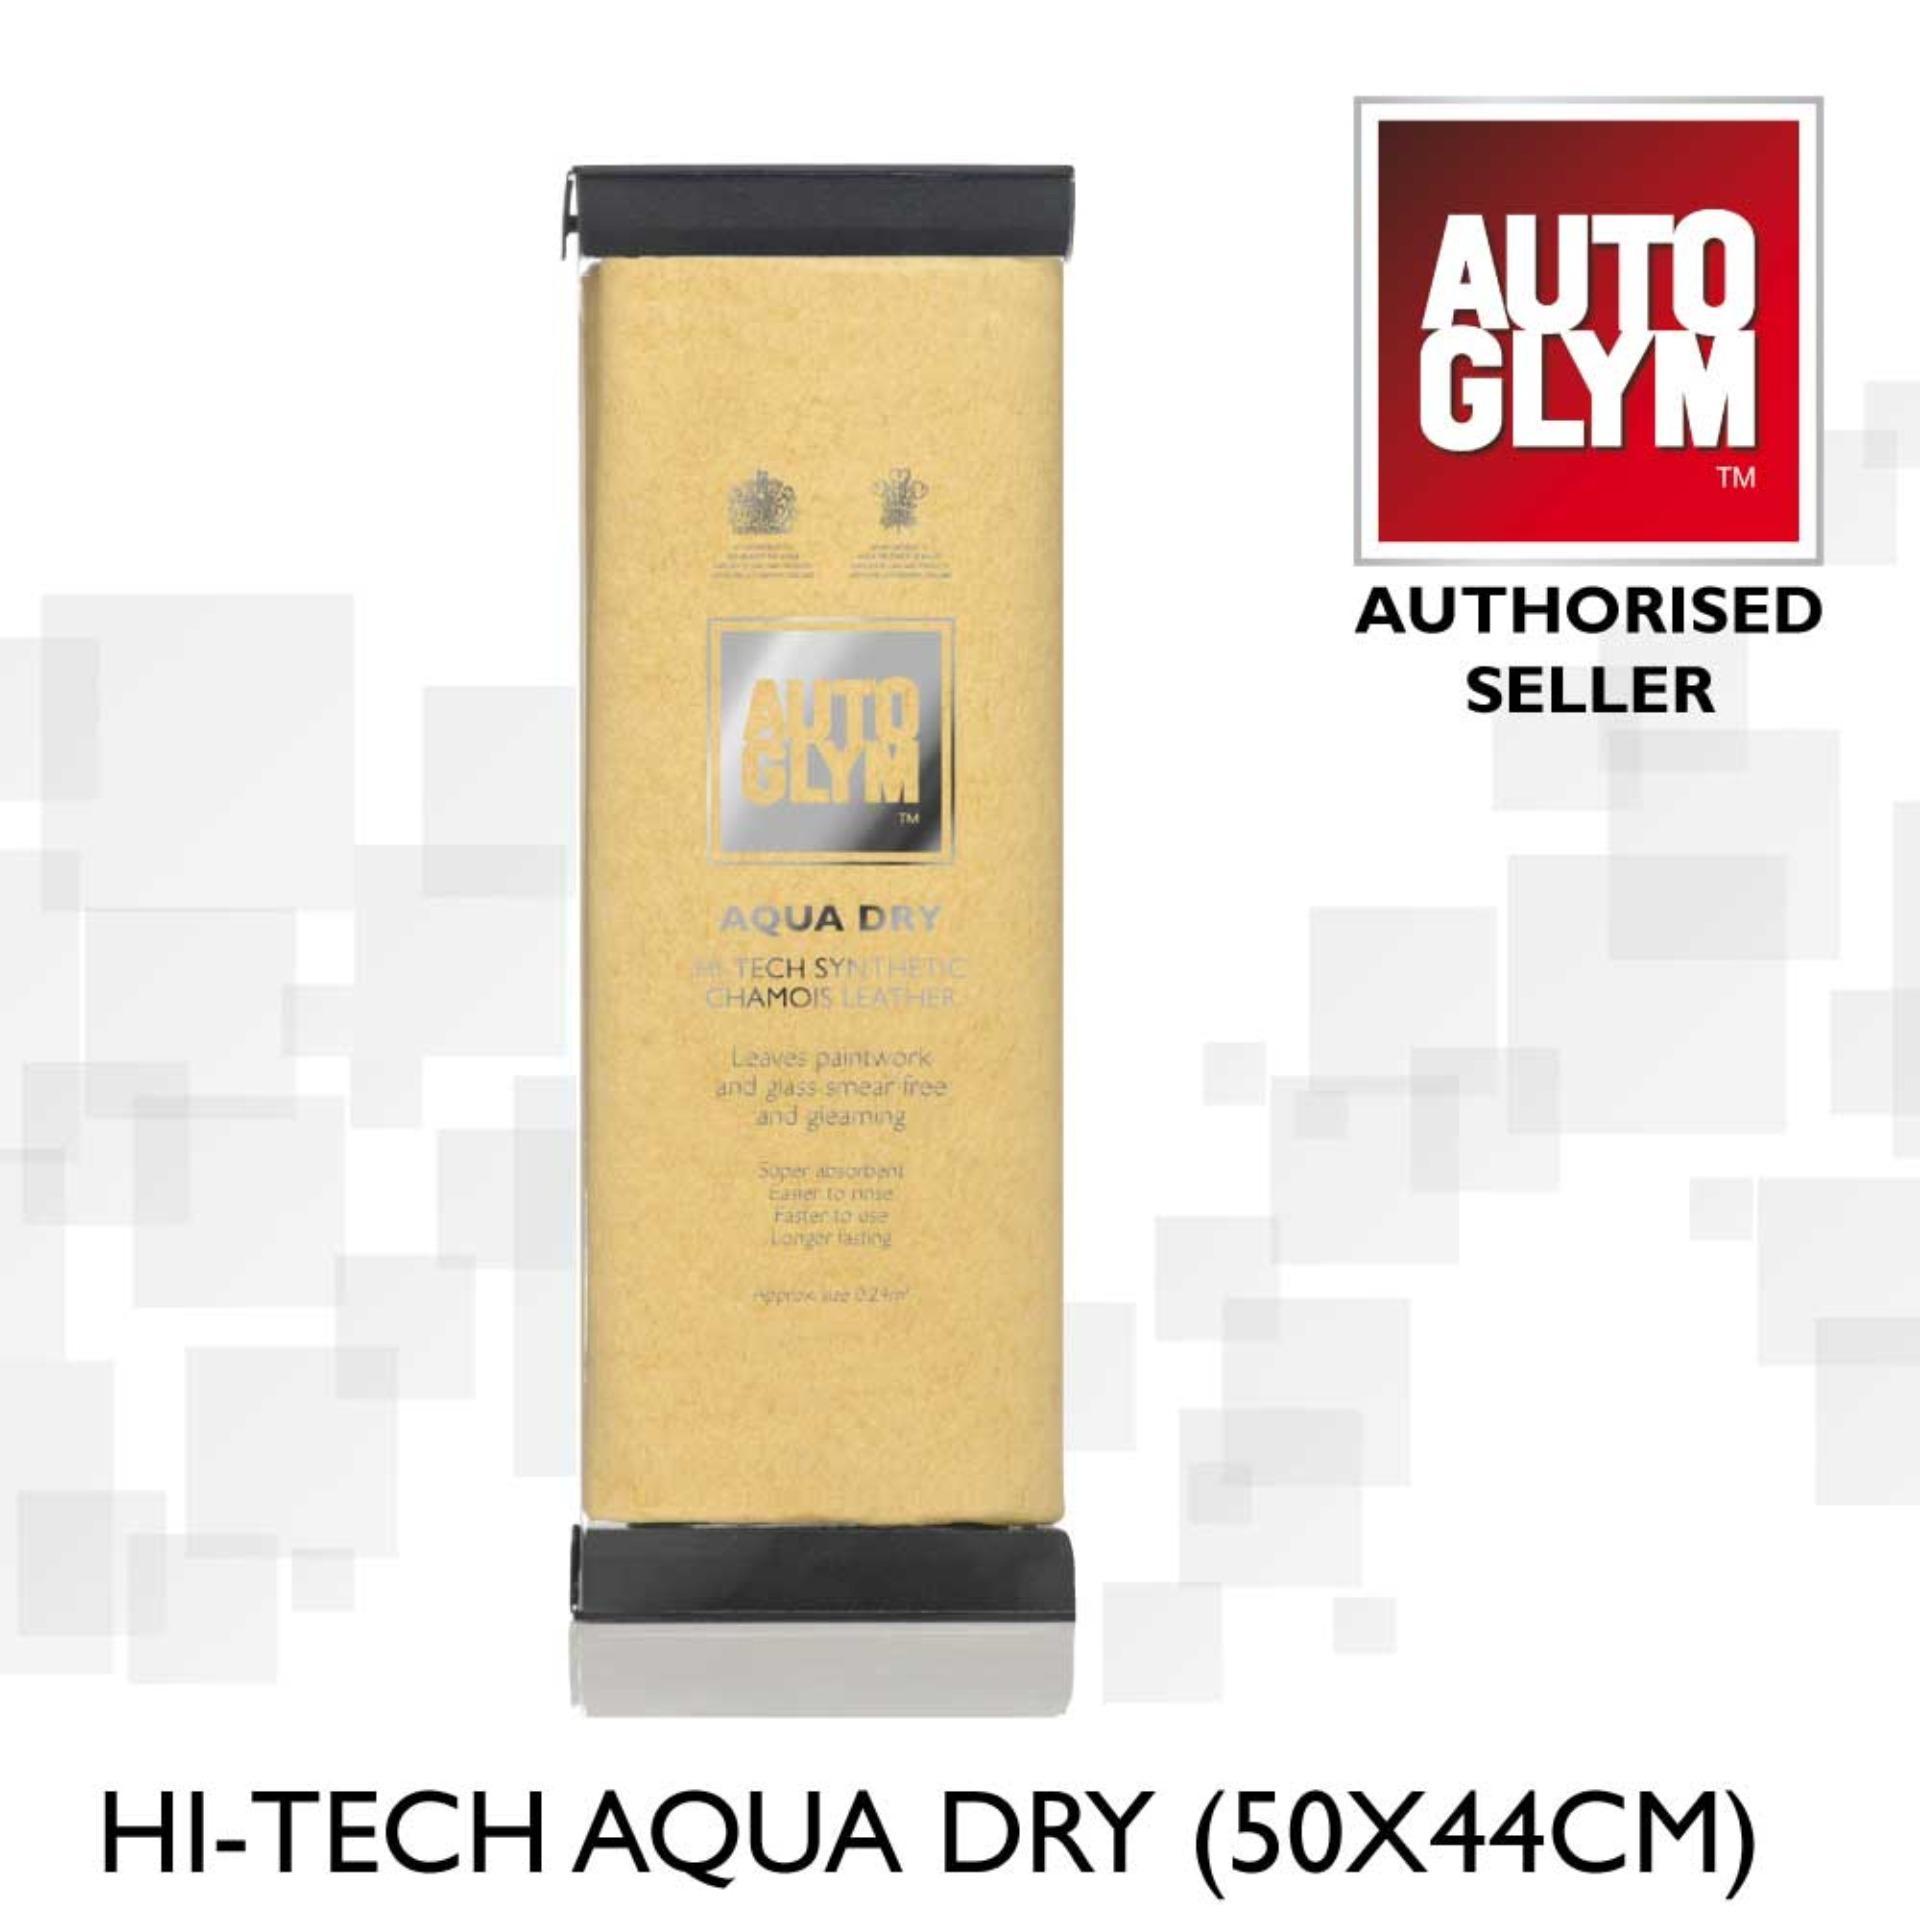 Autoglym Hi-Tech Aqua-Dry 50cm X 44cm.